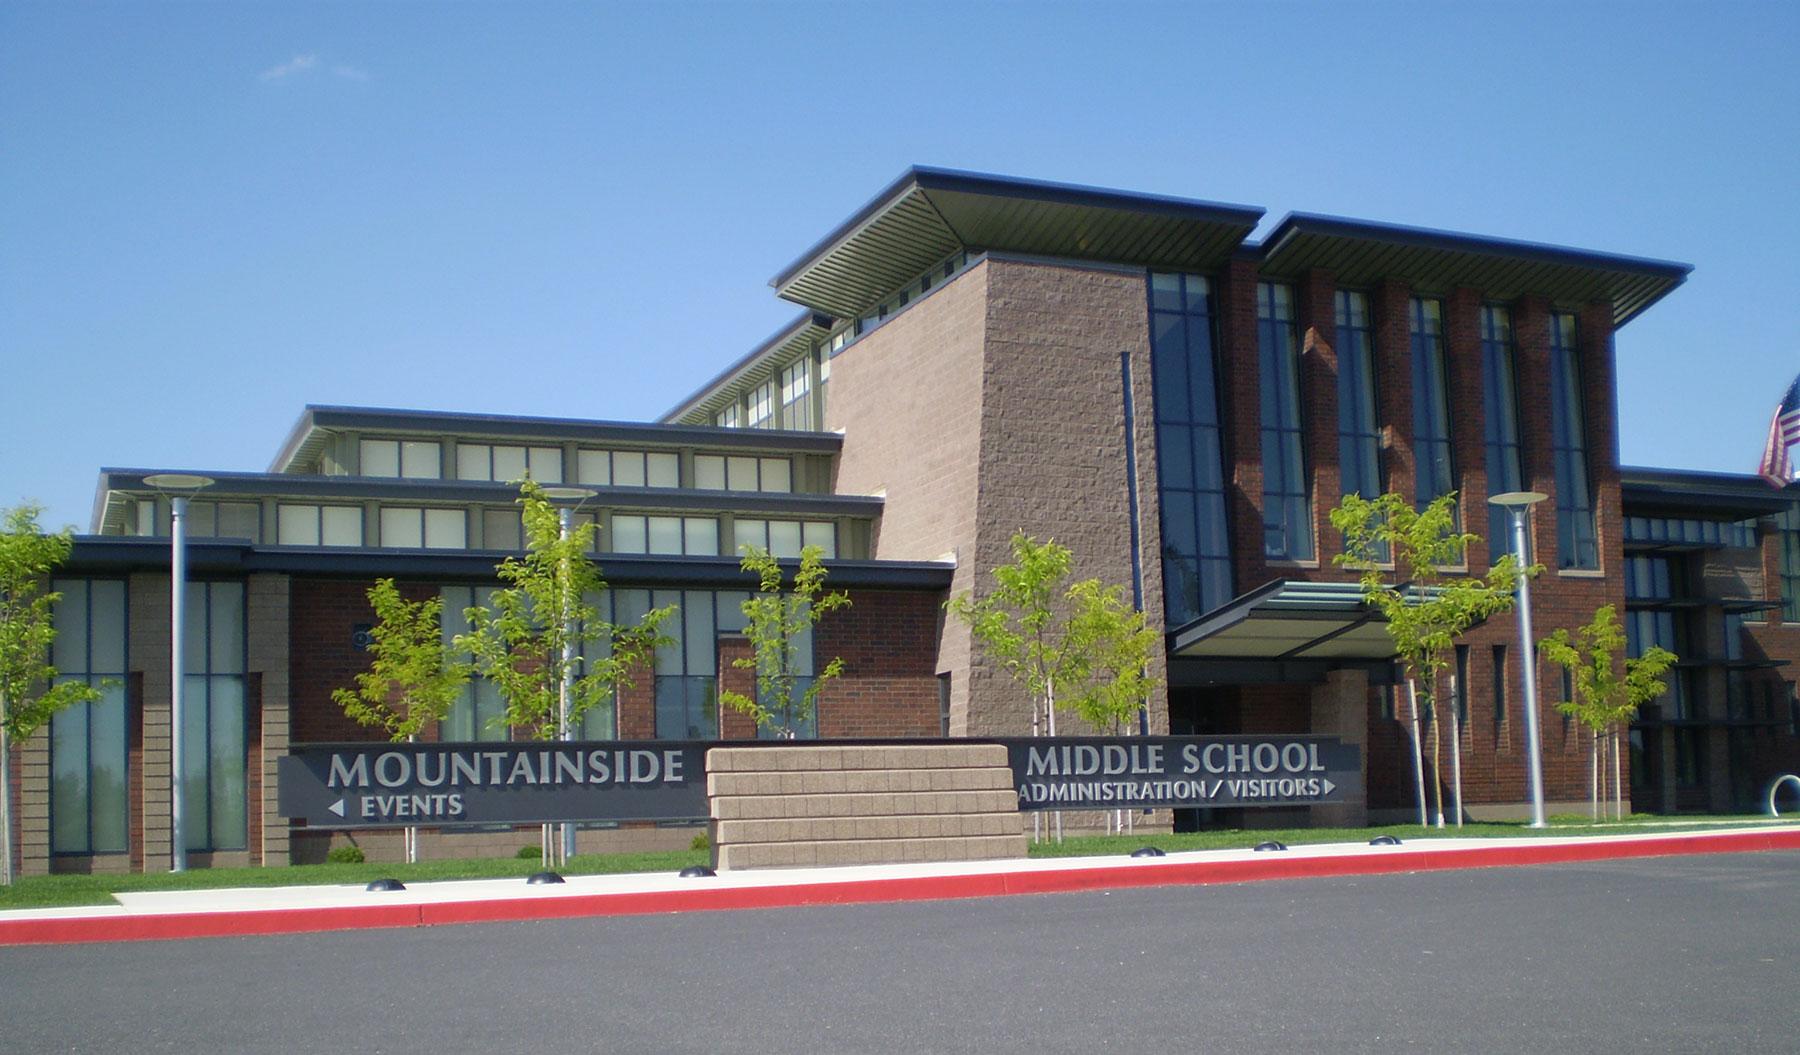 Mountainside Middle-School